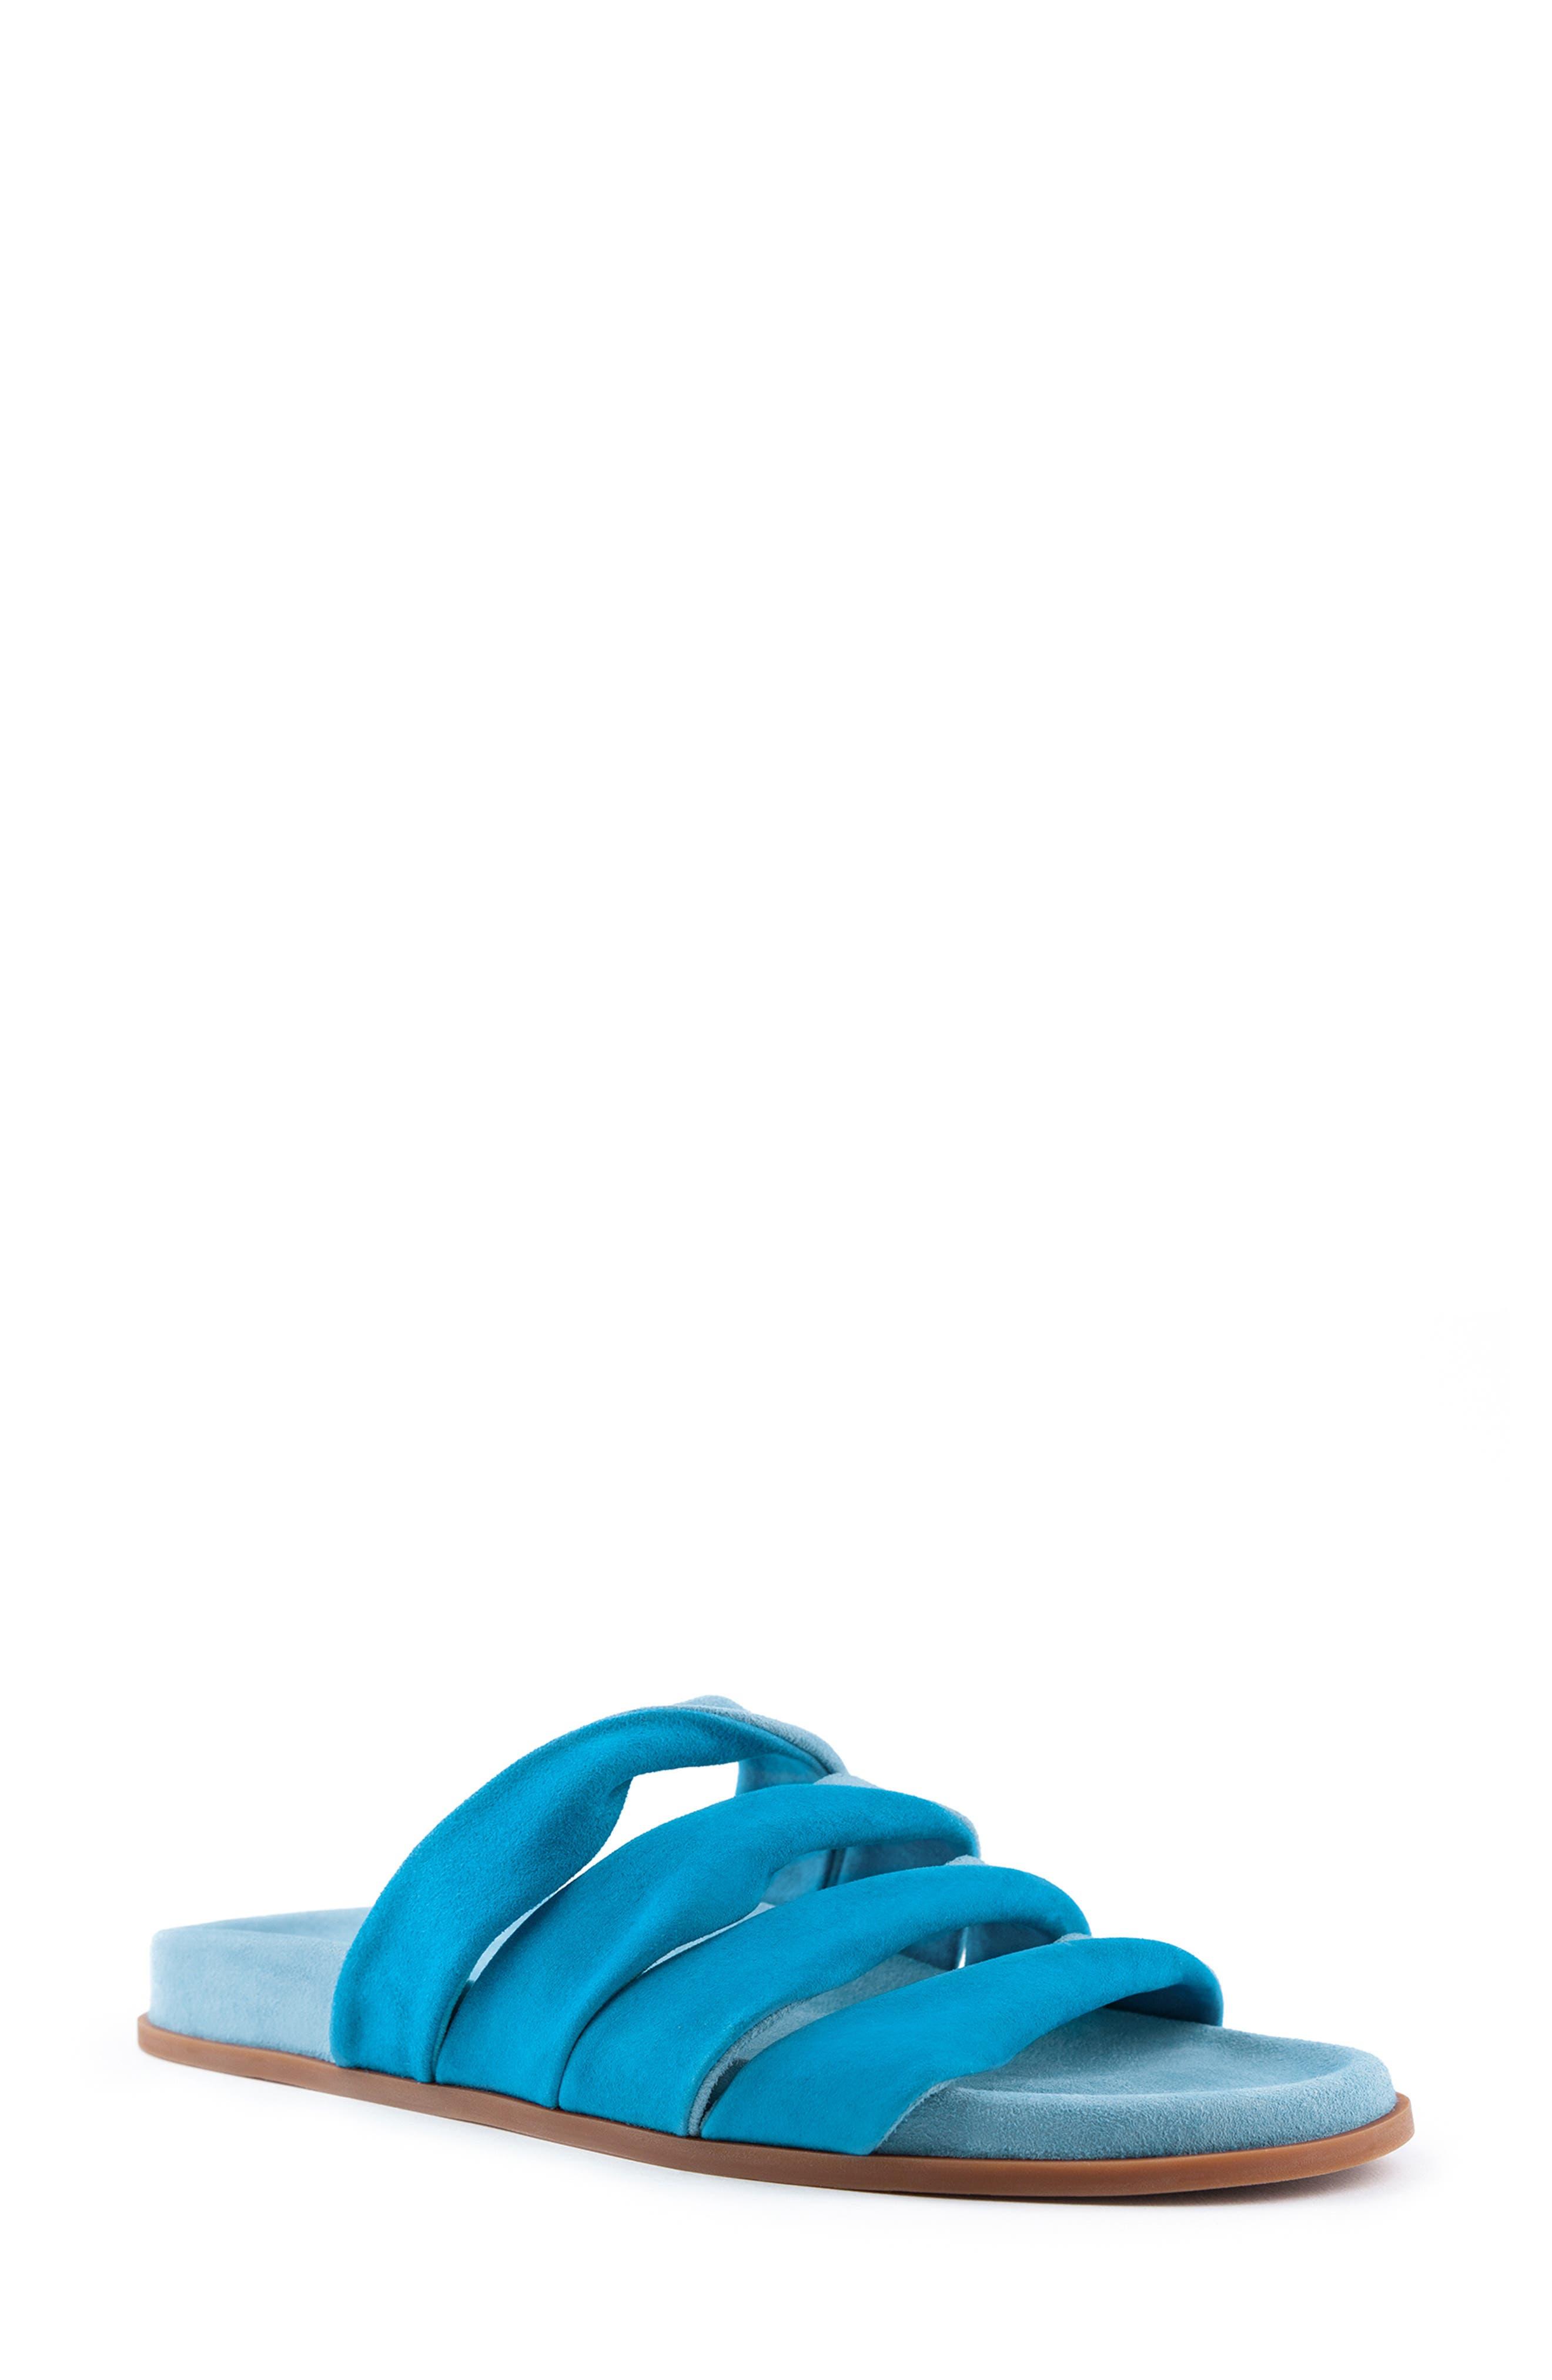 Mascia Waterproof Slide Sandal